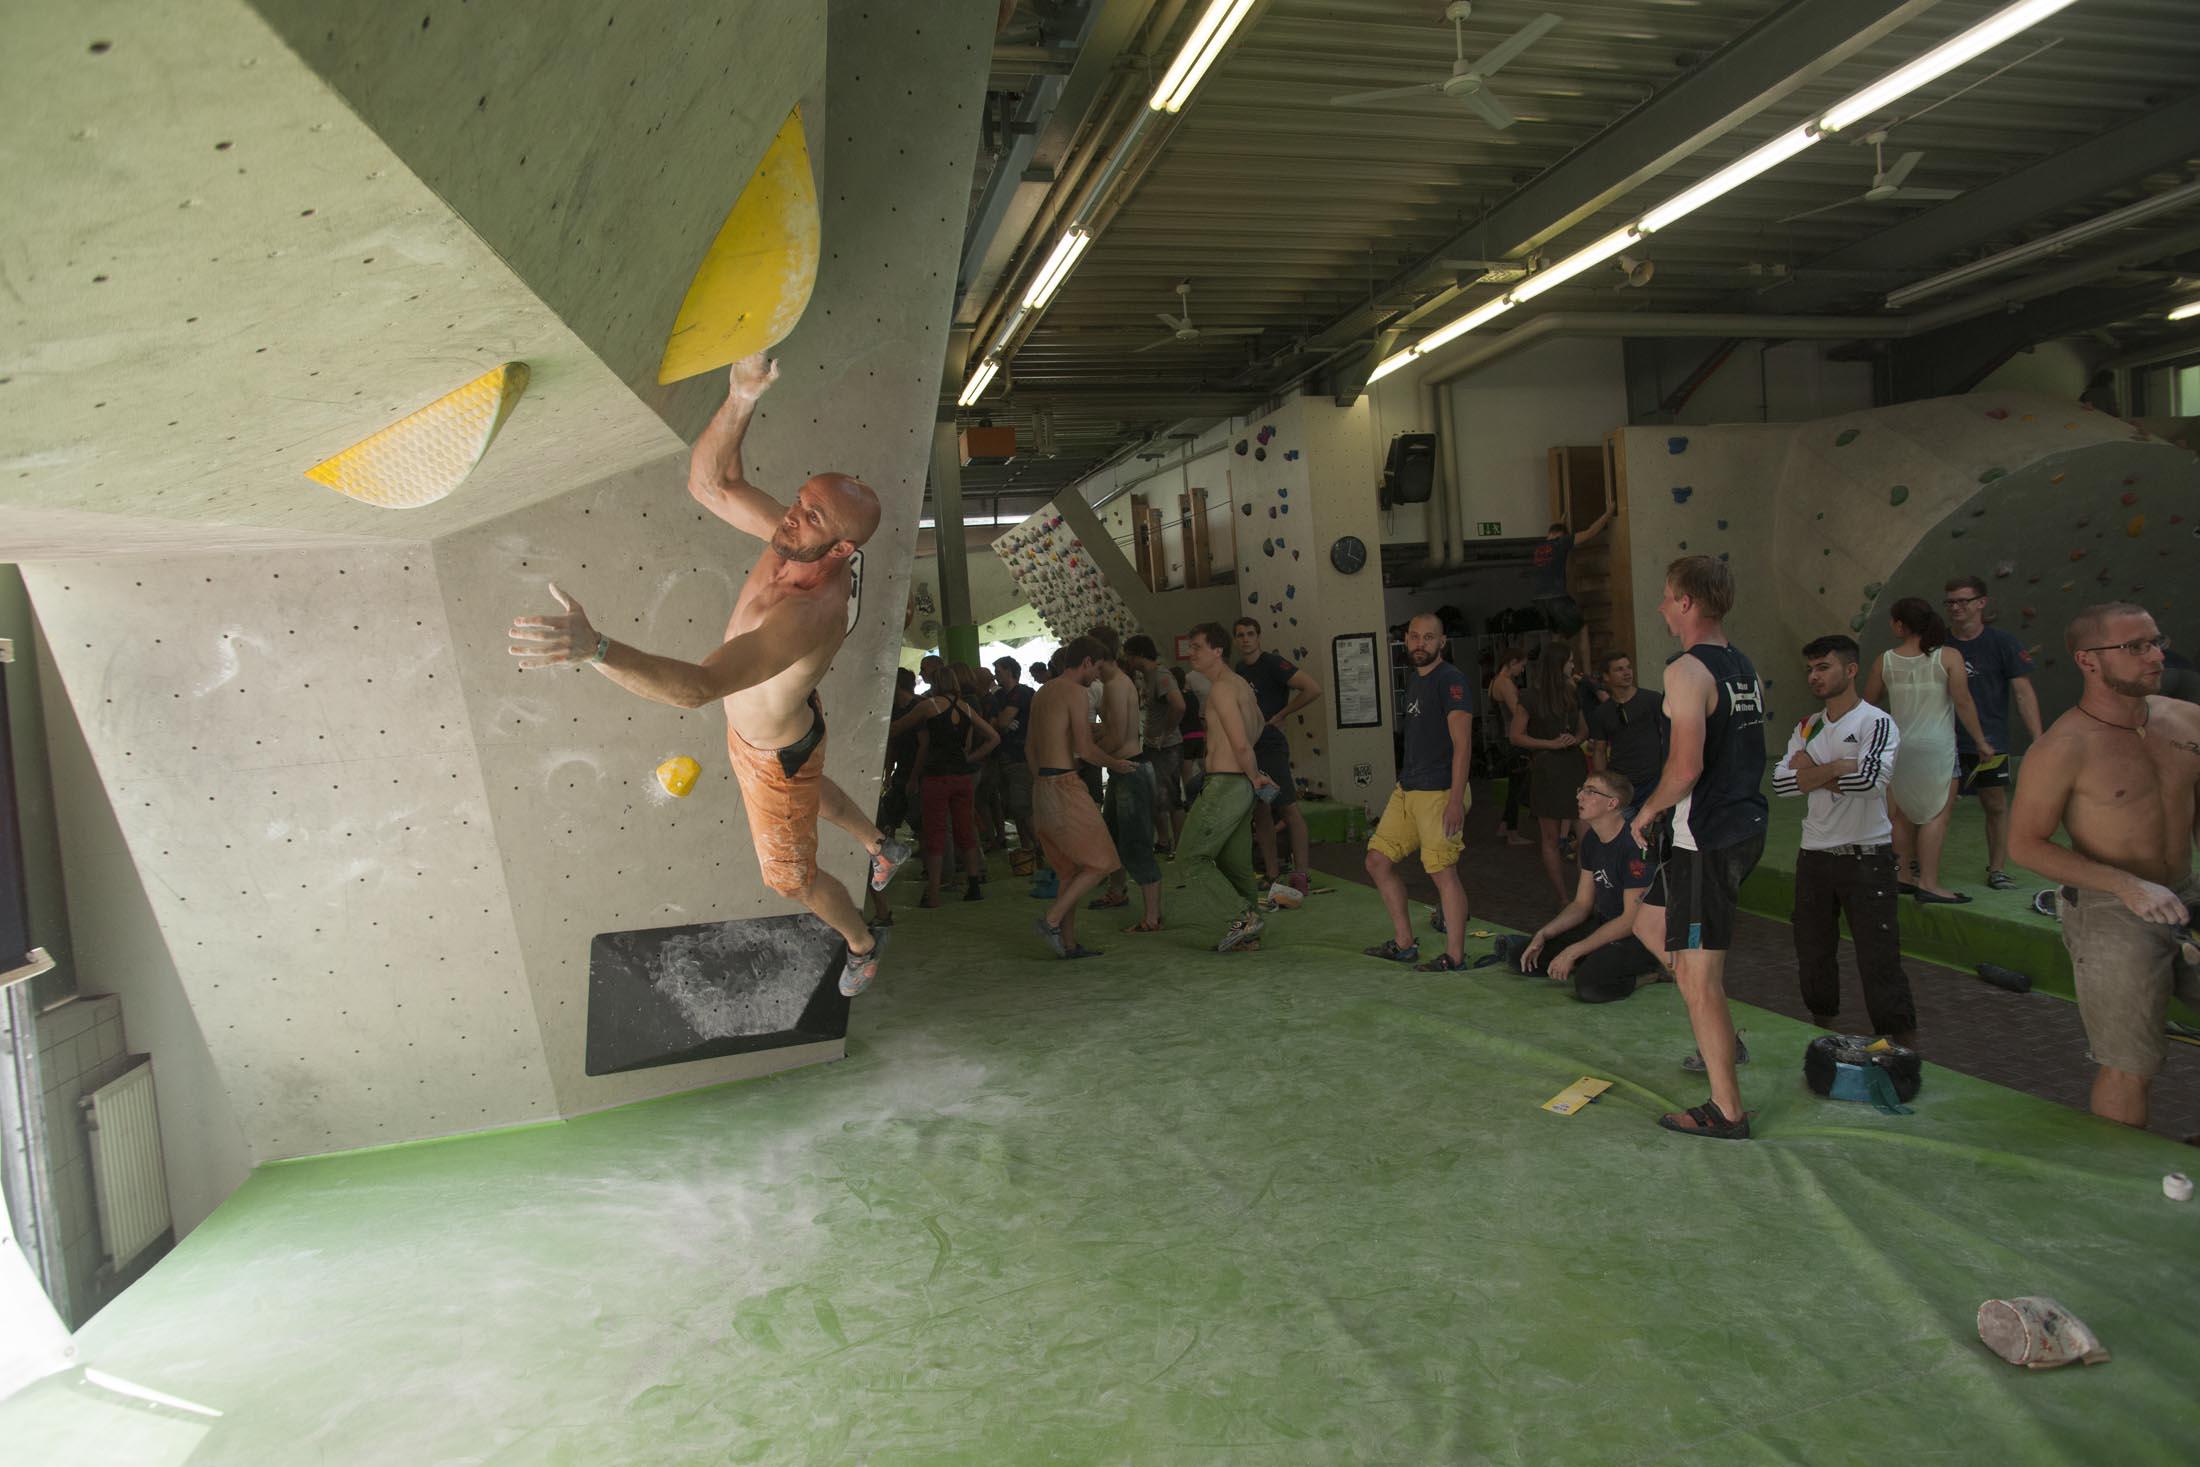 Quali, internationaler bouldercup Frankenjura 2016, BLOCKHELDEN Erlangen, Mammut, Bergfreunde.de, Boulderwettkampf07092016407